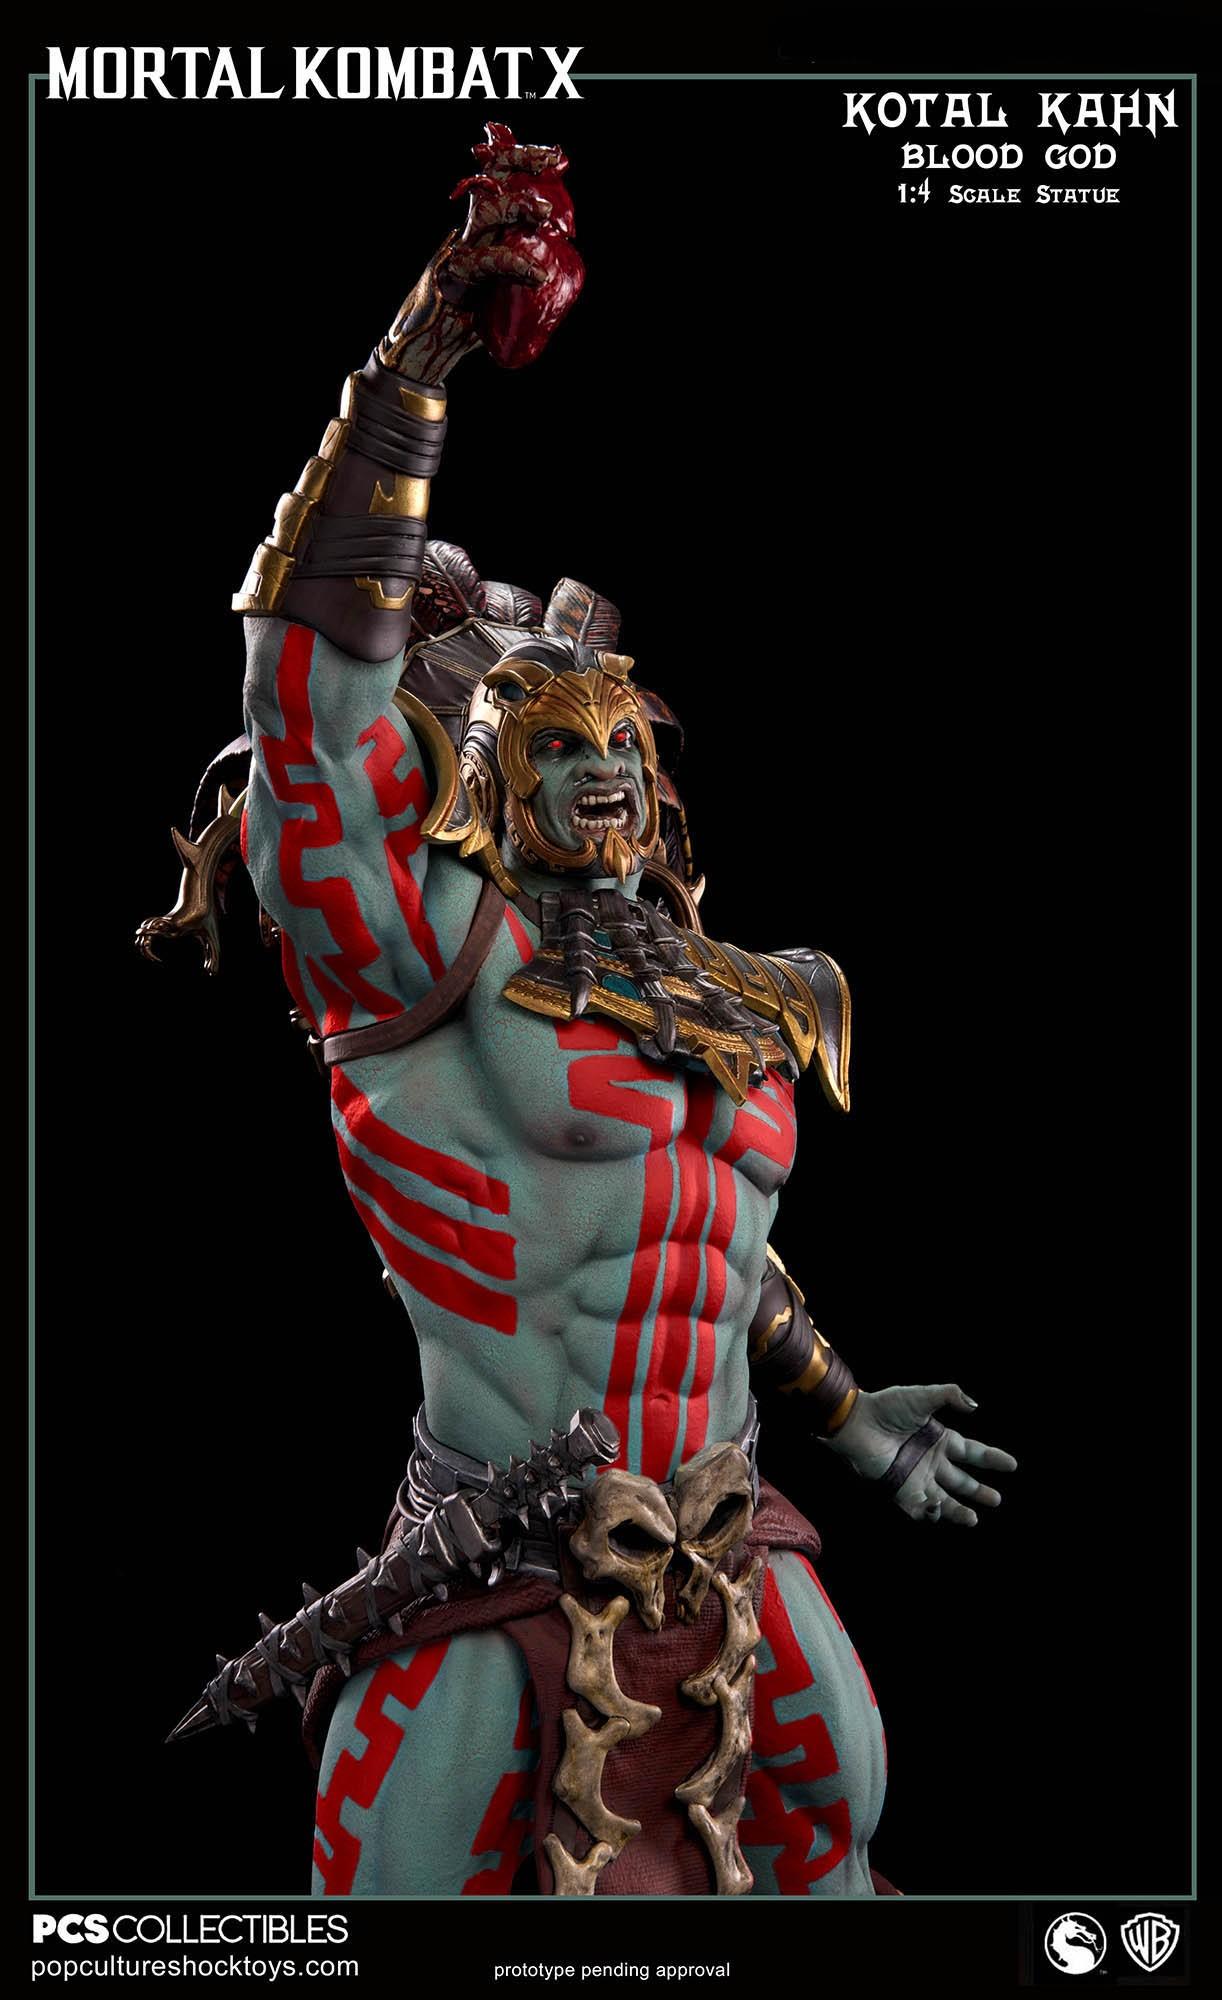 [Pop Culture Shock] Mortal Kombat X: Kotal Kahn 1:4 scale PCS-Kotal-Kahn-Blood-God-015